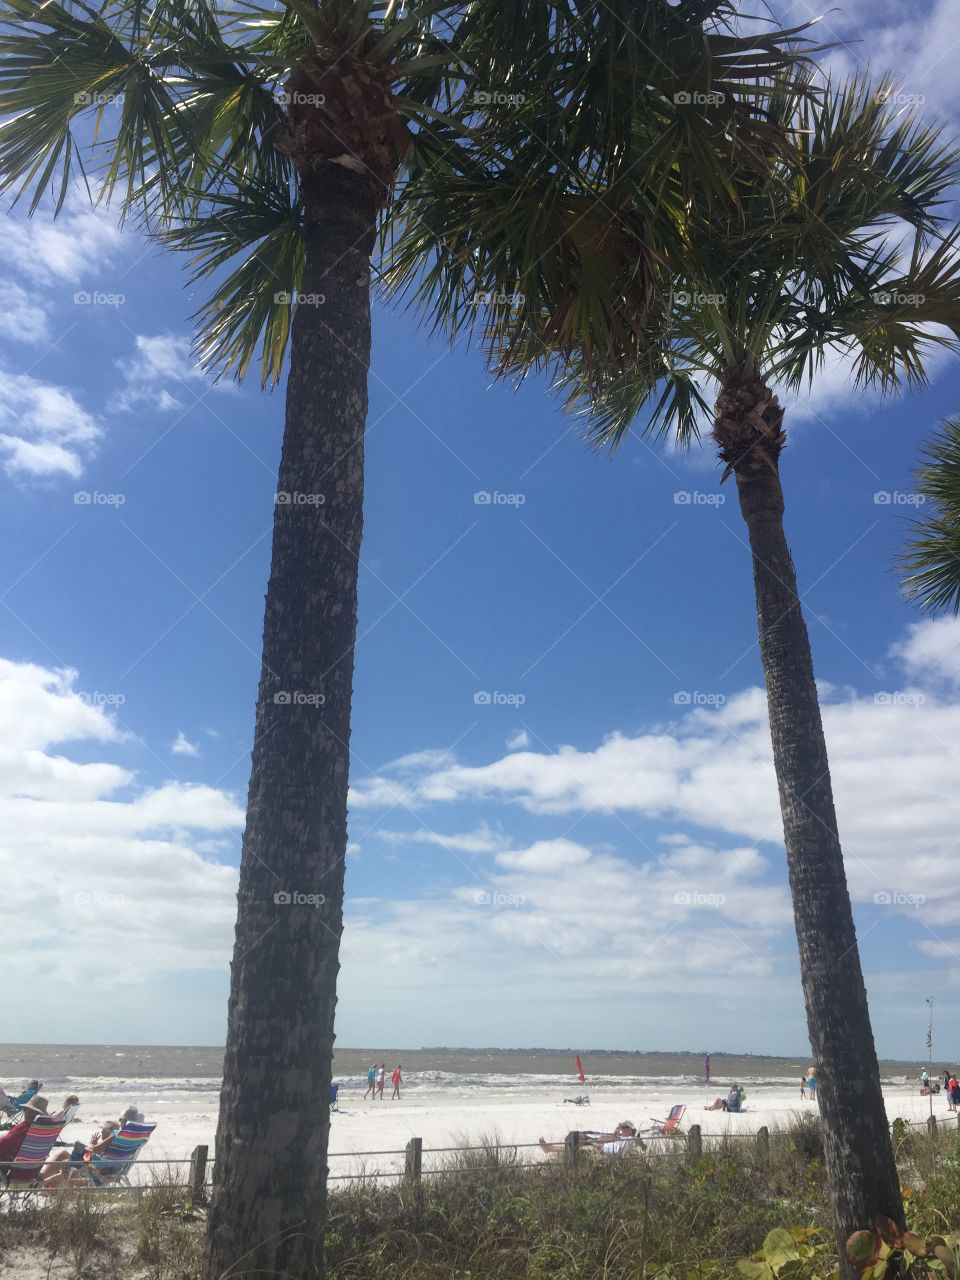 Tree, No Person, Beach, Seashore, Outdoors